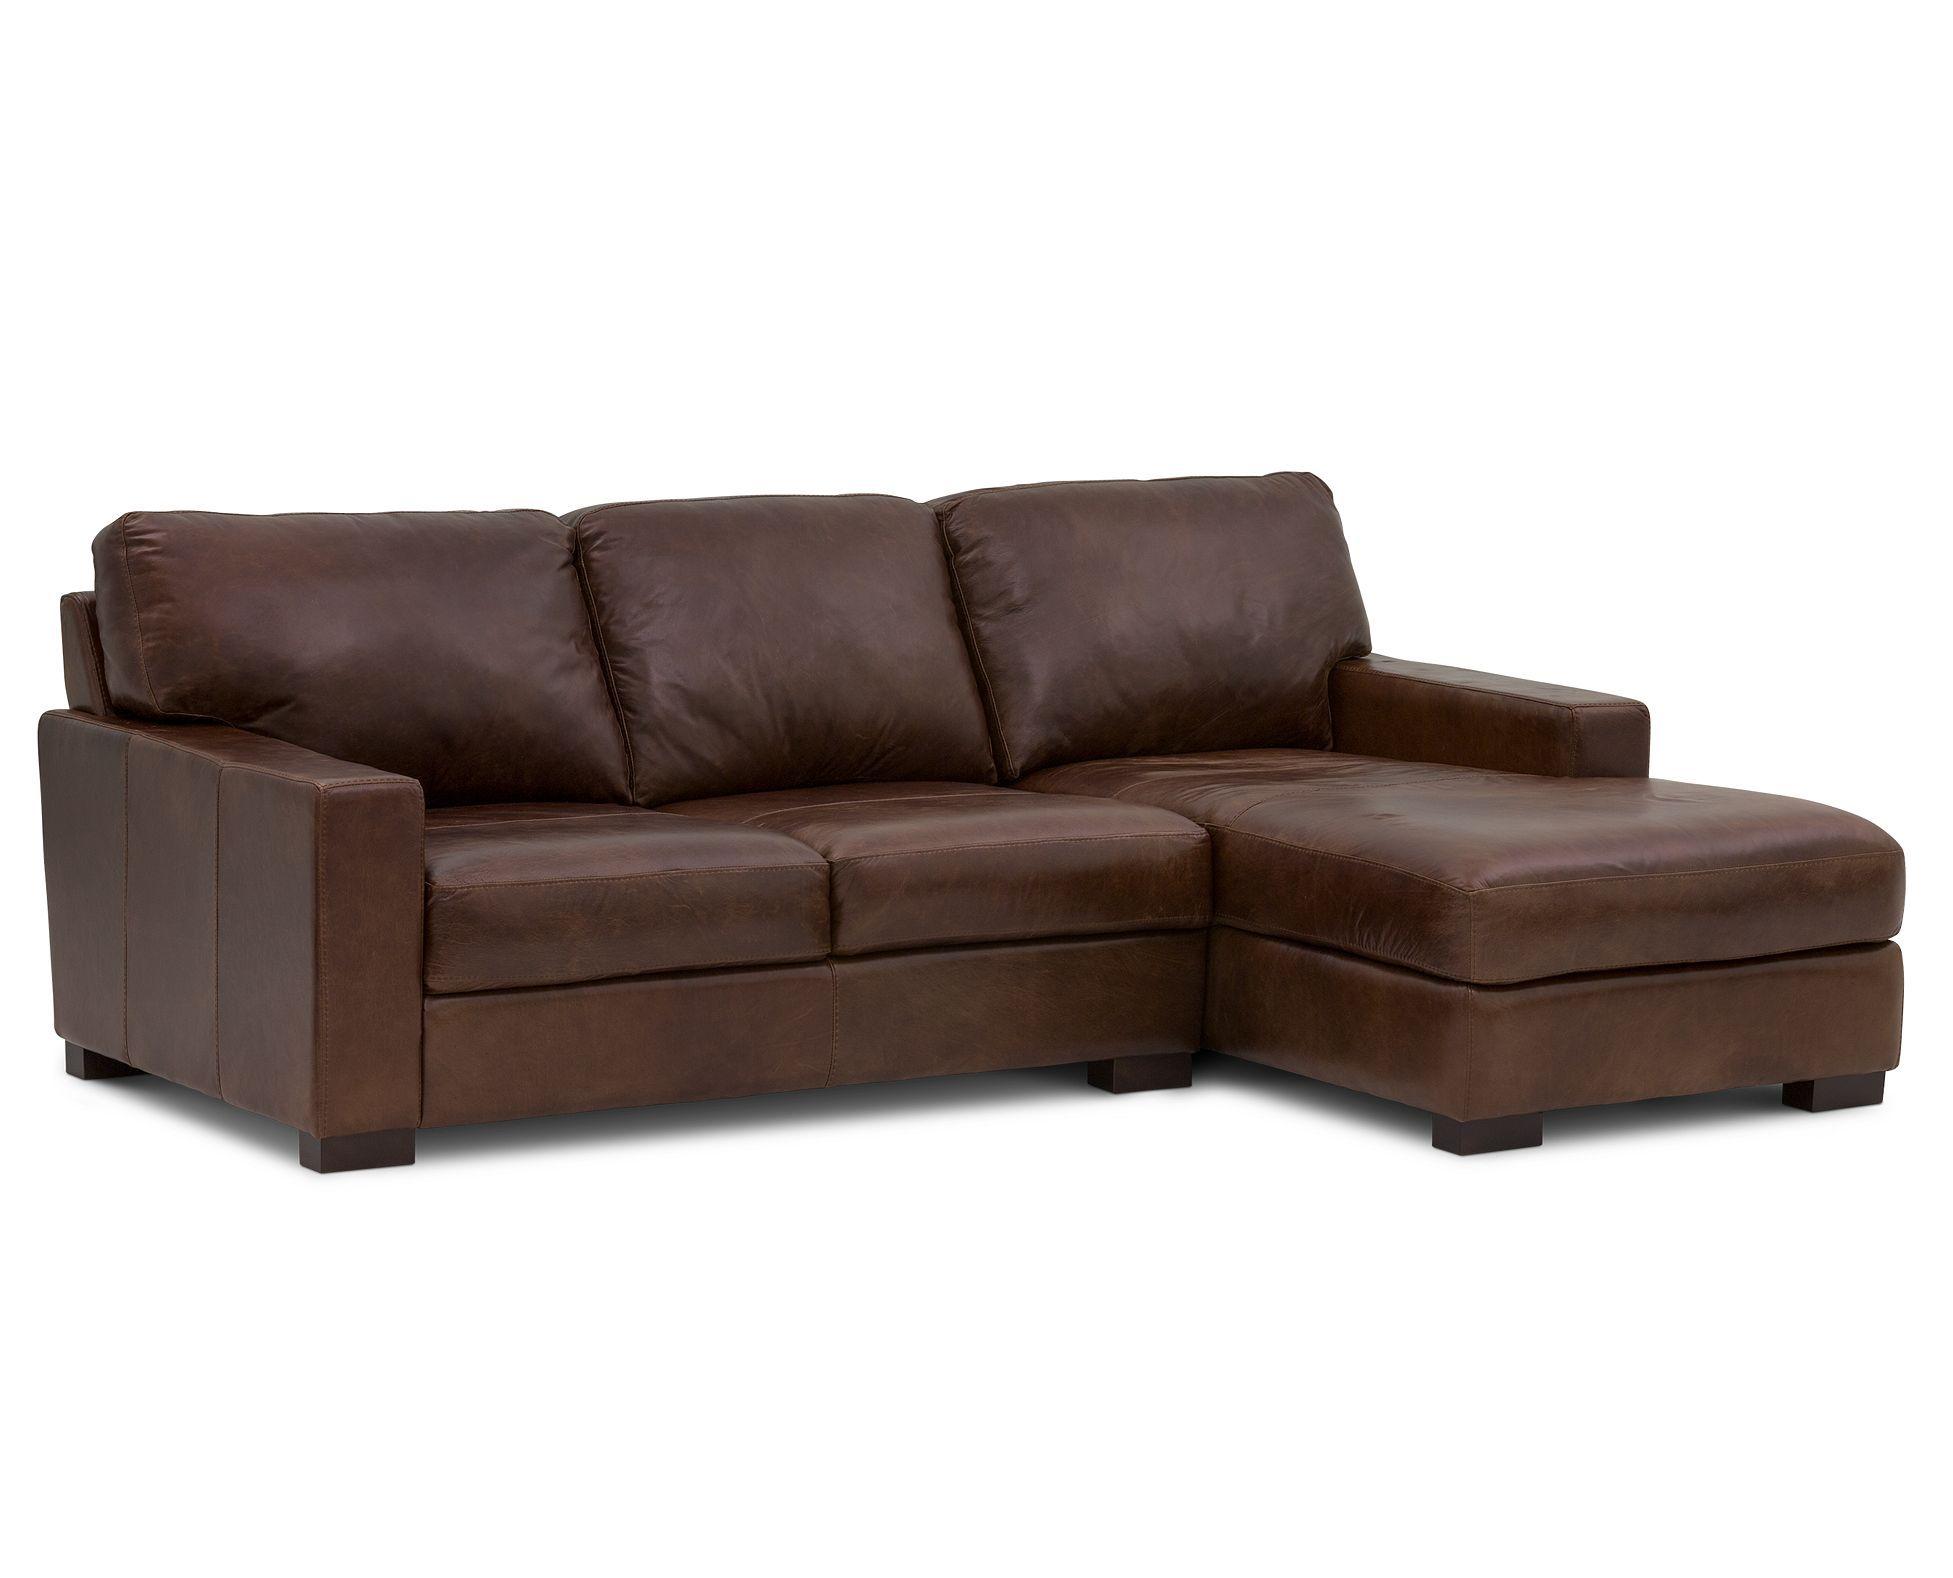 Durango 2 Pc Loveseat Sectional Furniture Row